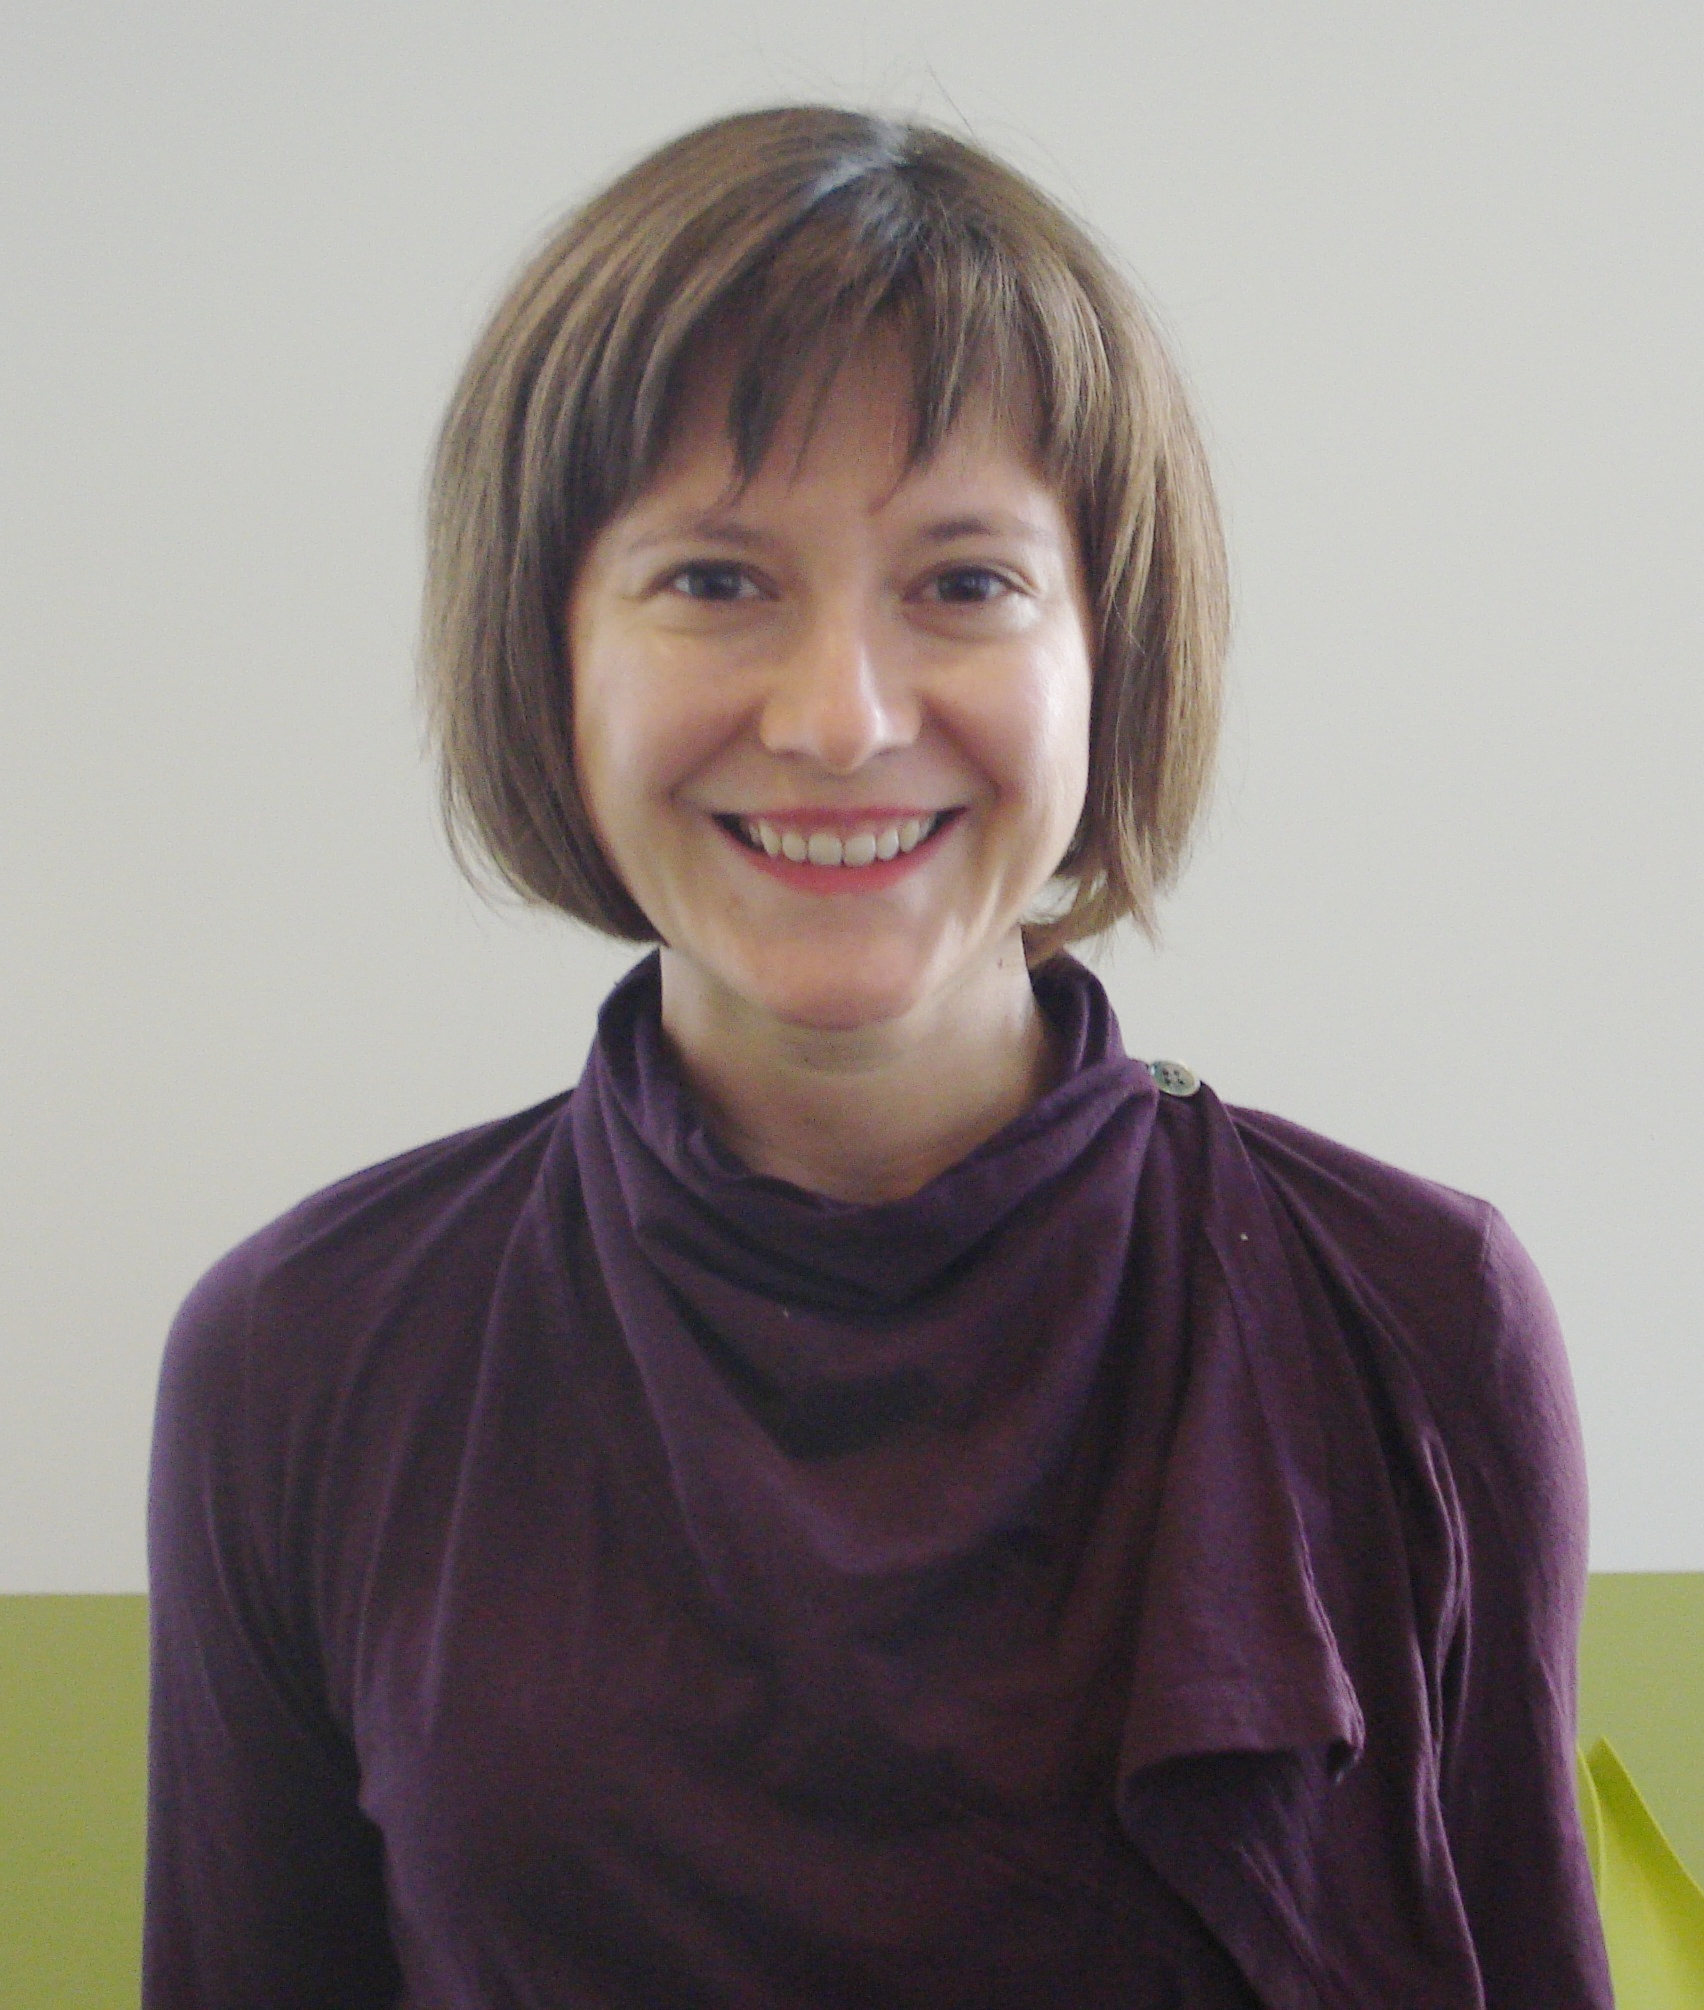 Wendy D'Andrea, Ph.D - Associate Professor of Psychology